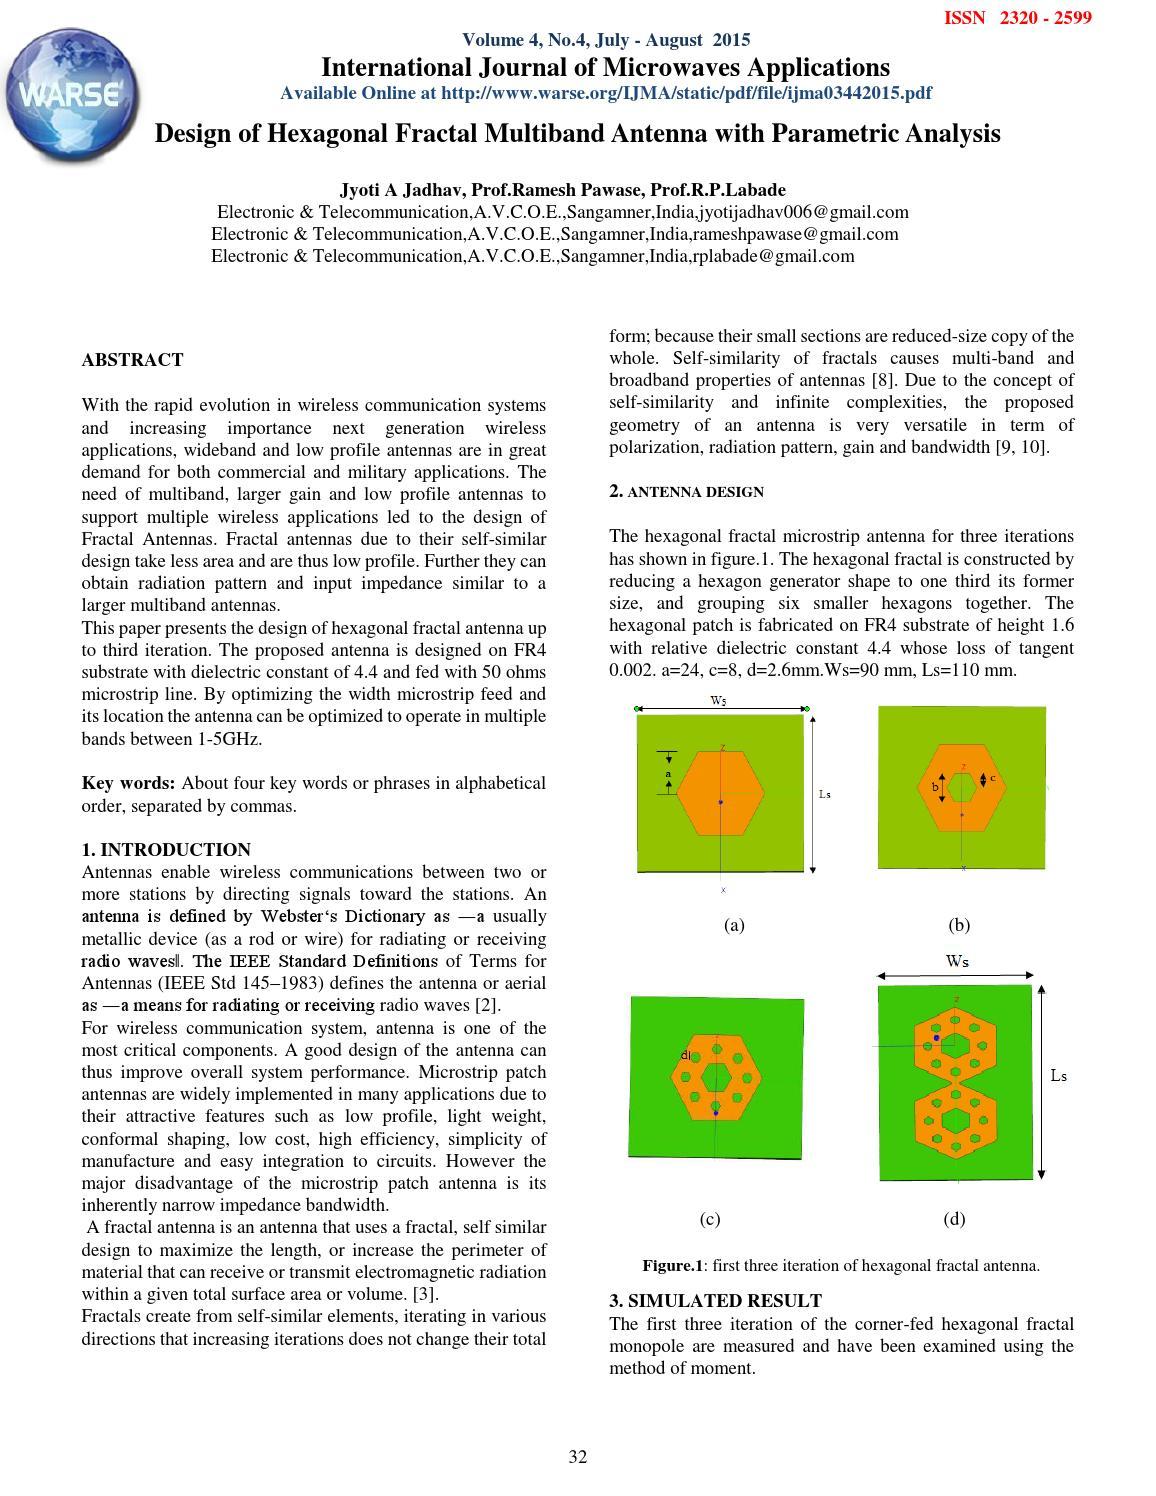 Design of Hexagonal Fractal Multiband Antenna with